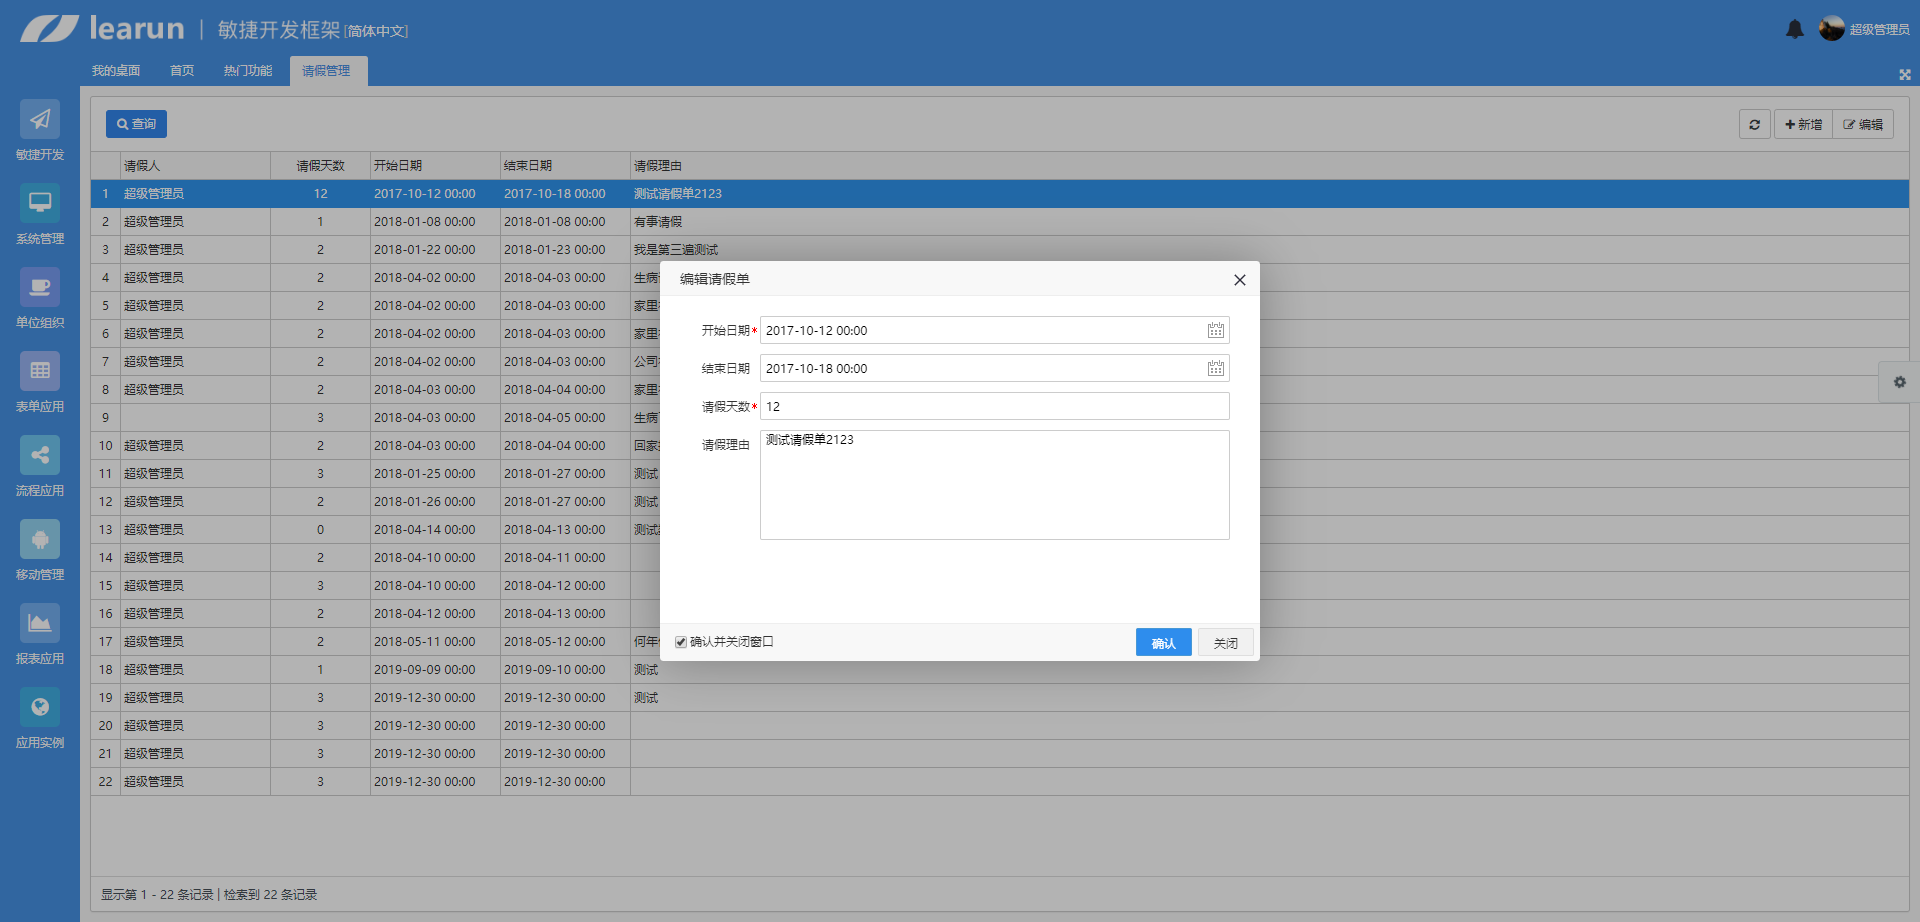 LeaRun .Net Core/Java工作流引擎,分离式前端,升级Vue